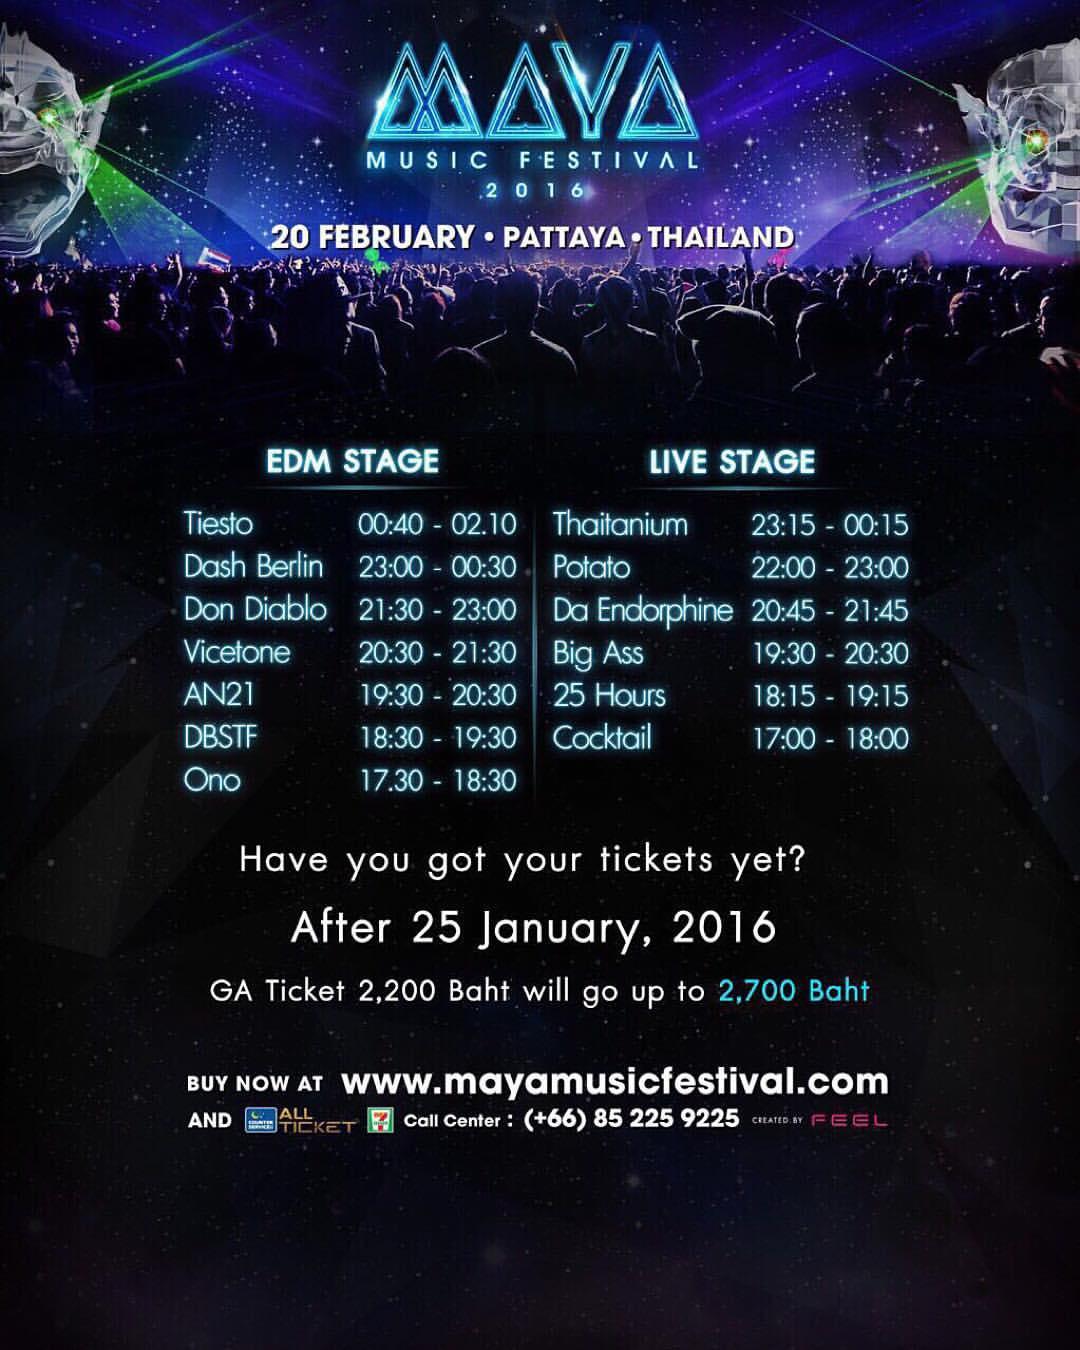 MAYA Music festival Timetable